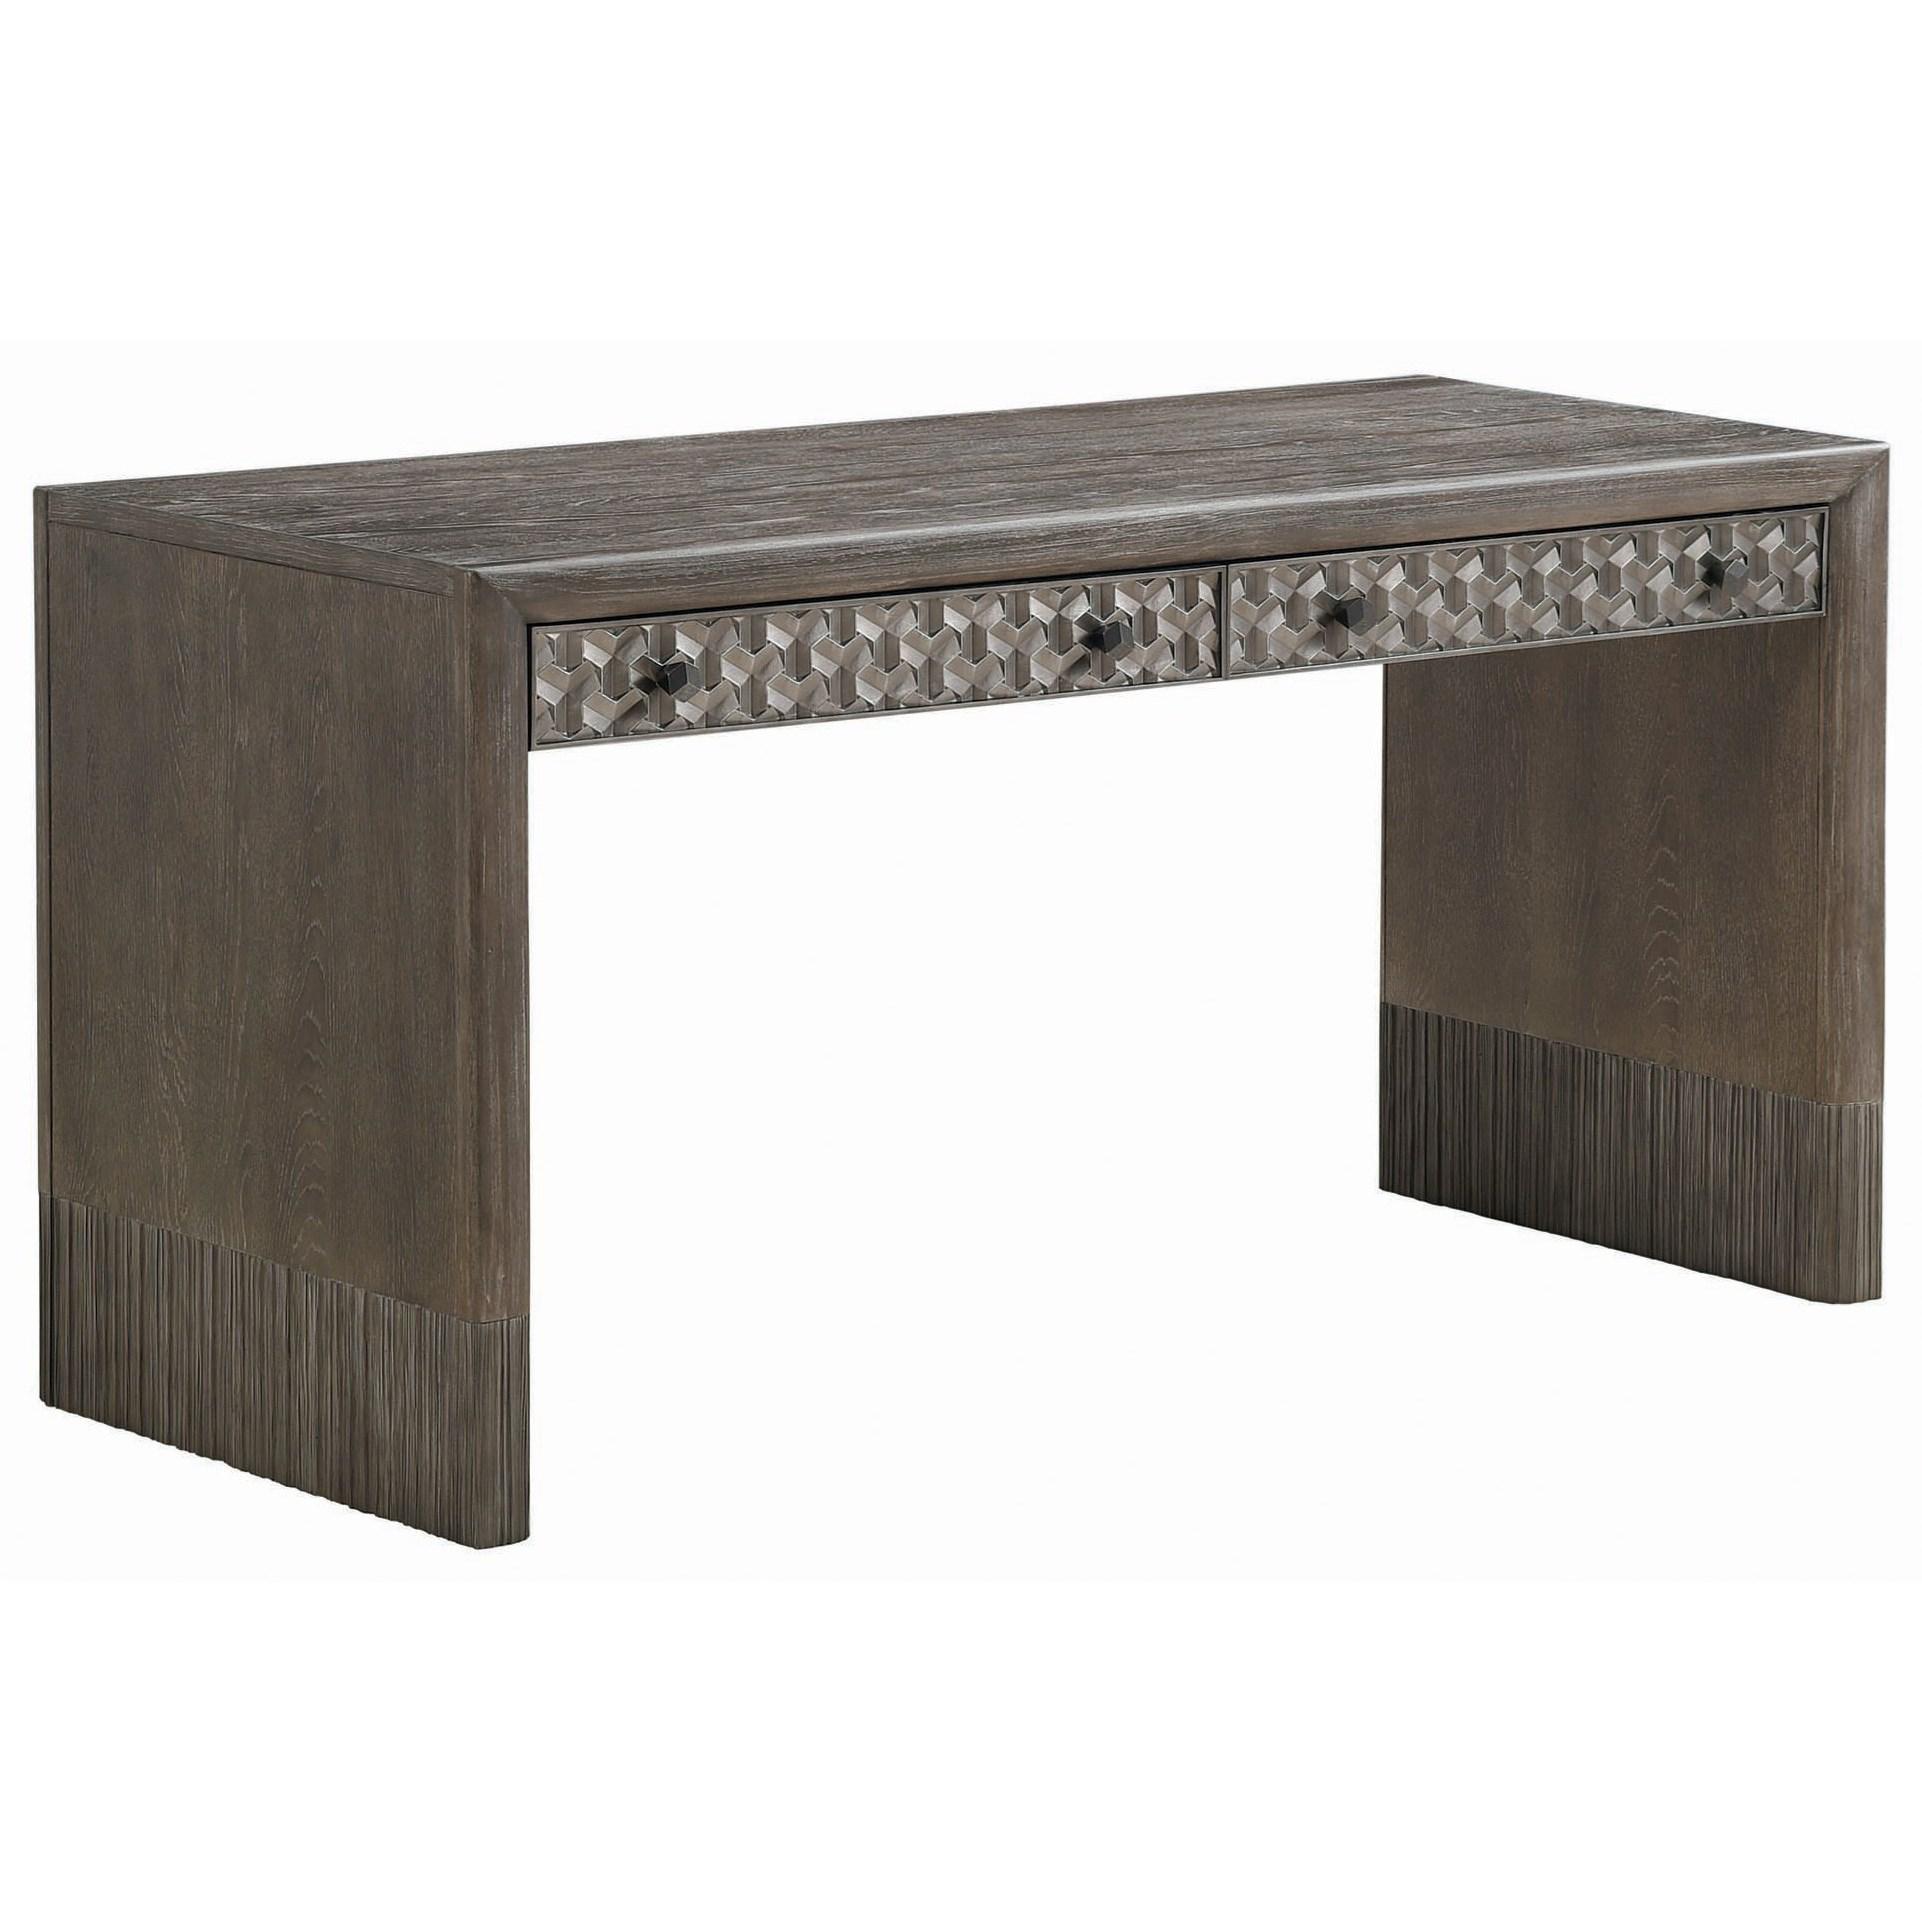 A.R.T. Furniture Inc Geode Selenite Writing Desk - Item Number: 238421-2303